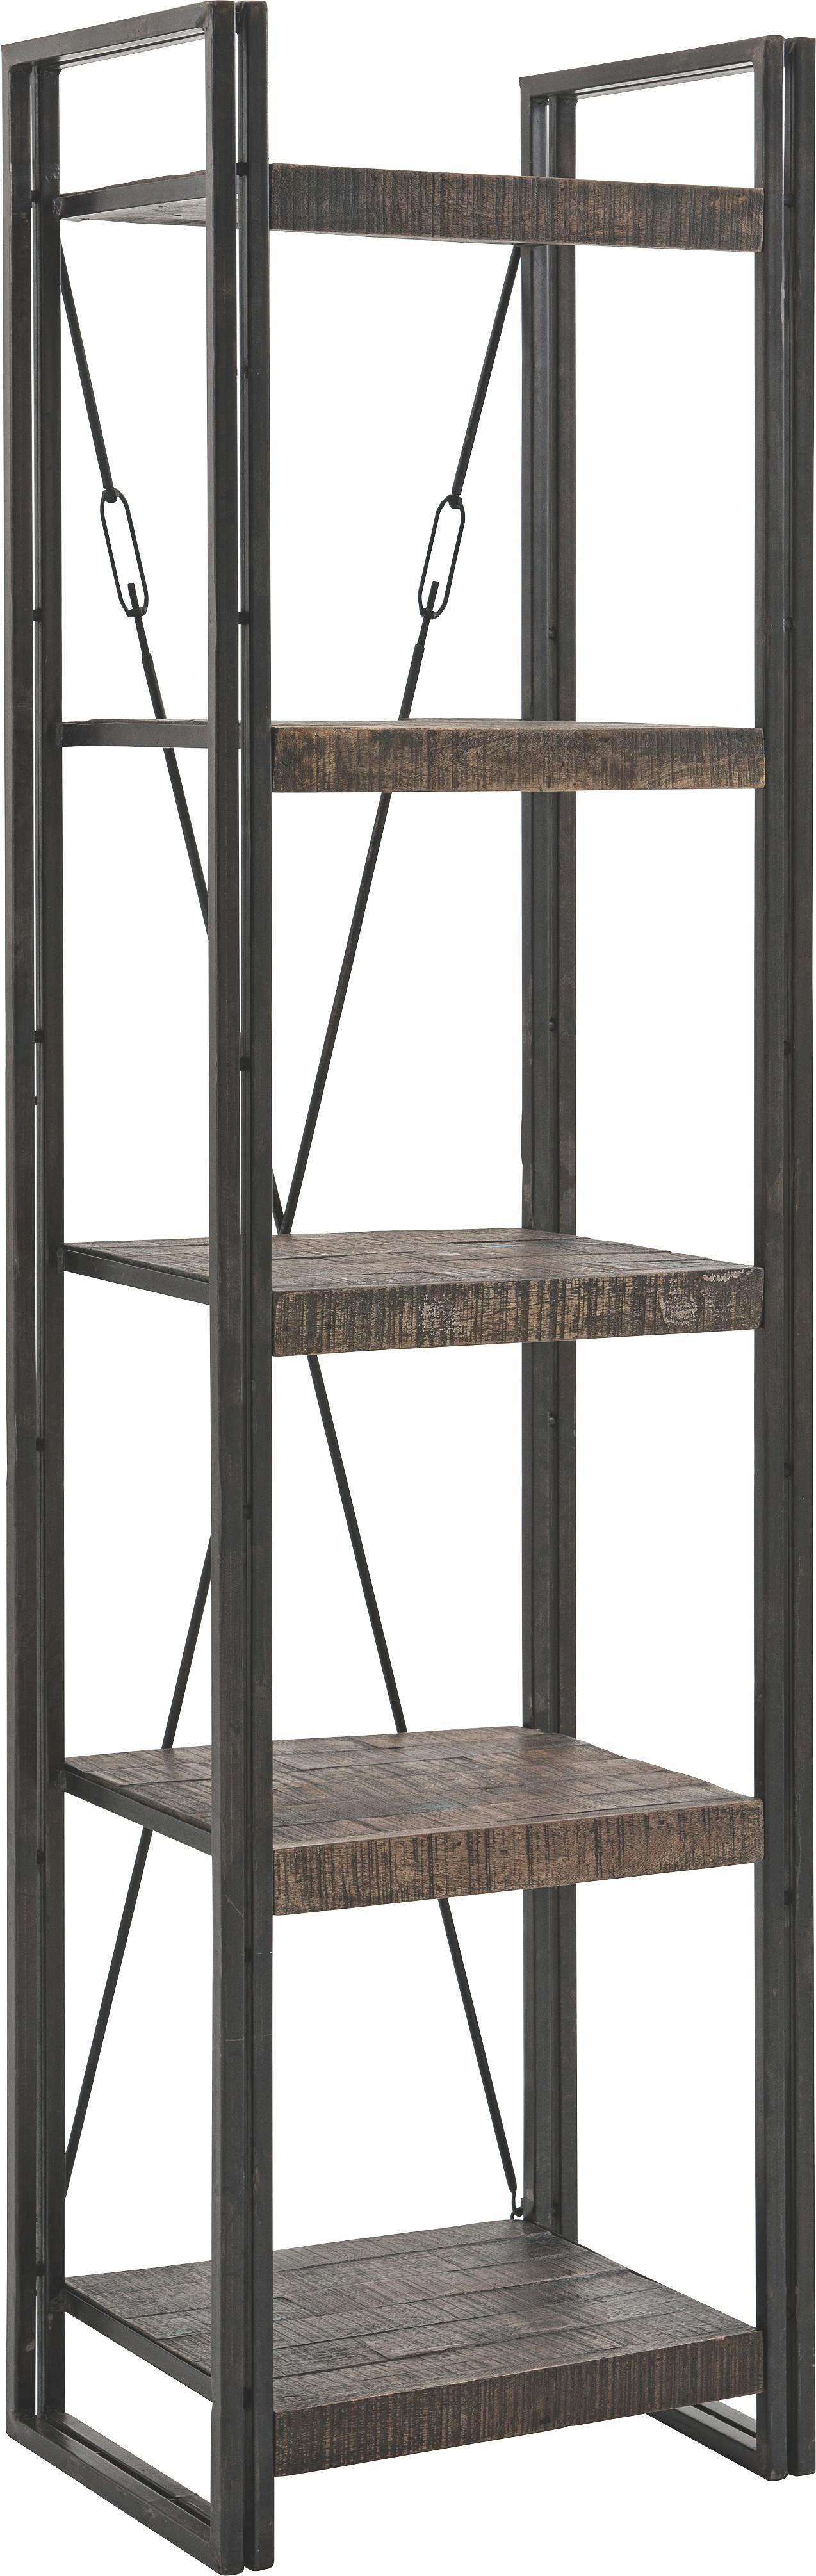 REGAL Mangoholz massiv Braun - Braun, Design, Holz/Metall (55/200/40cm)